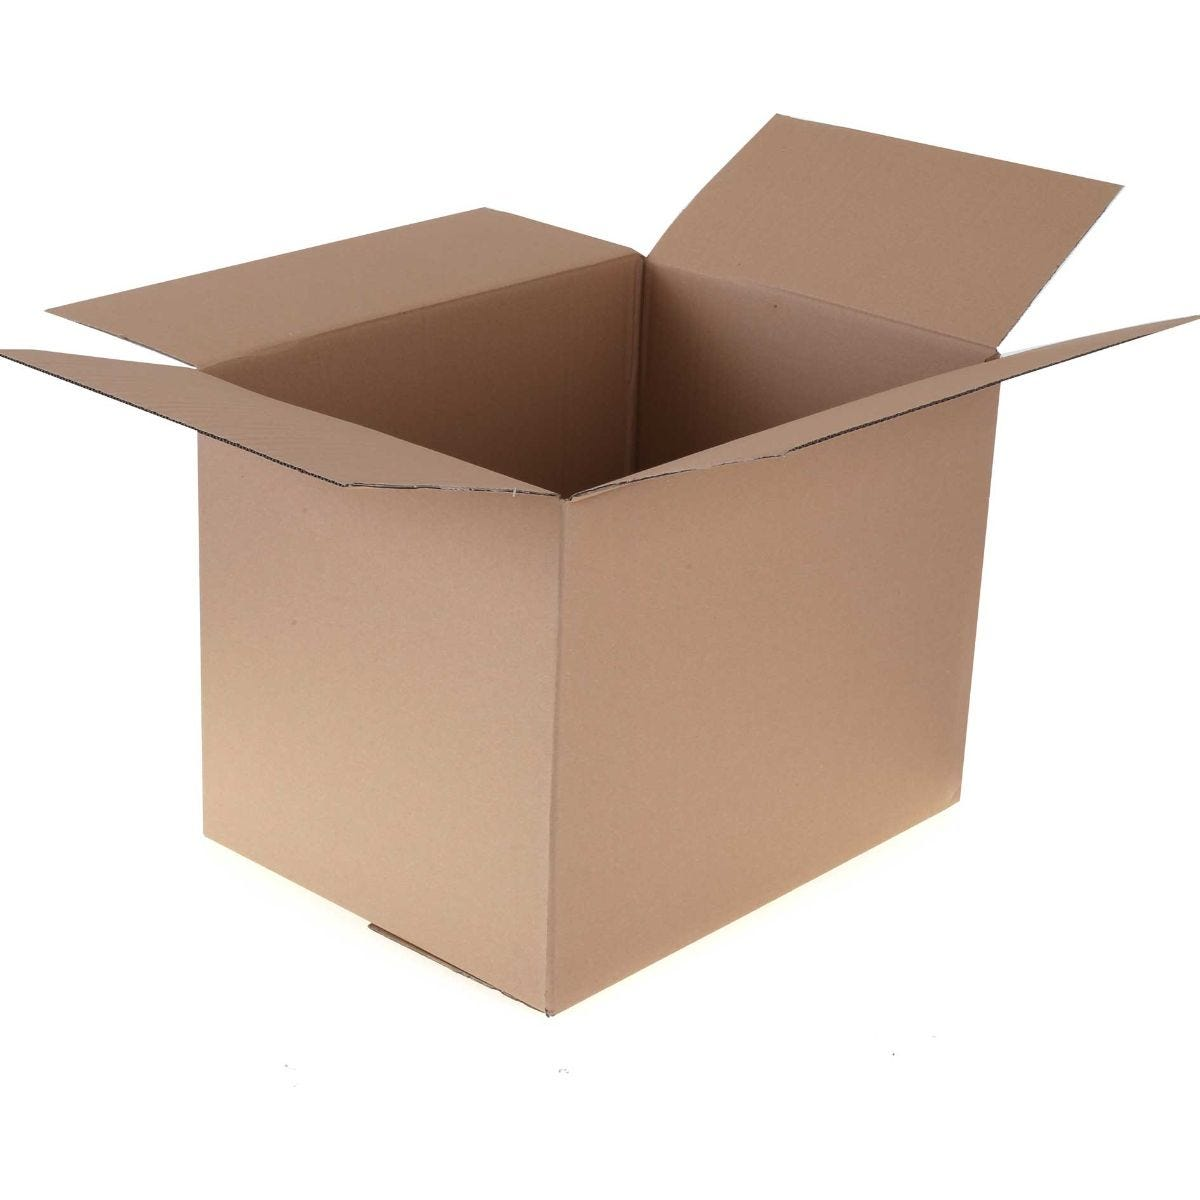 Single Walled Packing Carton H 460xD 460xW 612mm Large